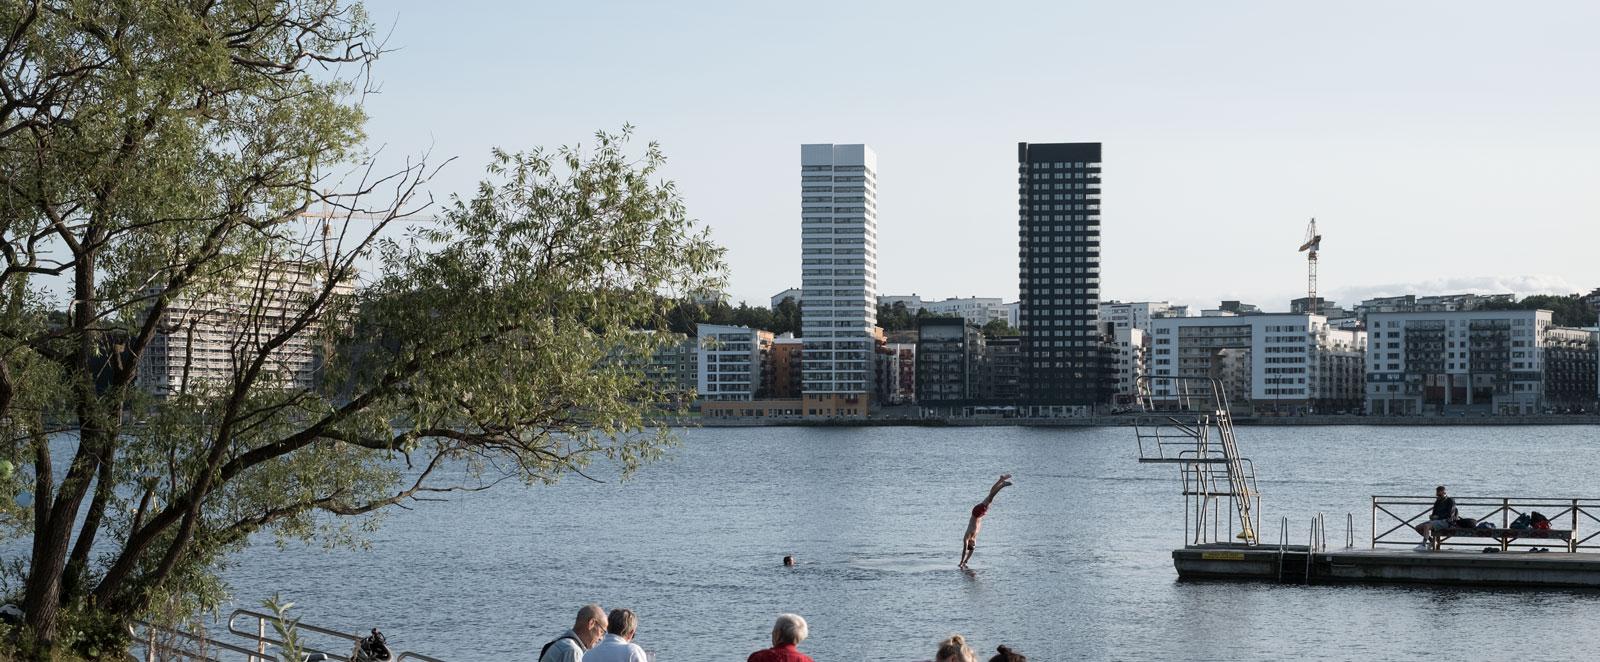 Stockholm Sodermalm.